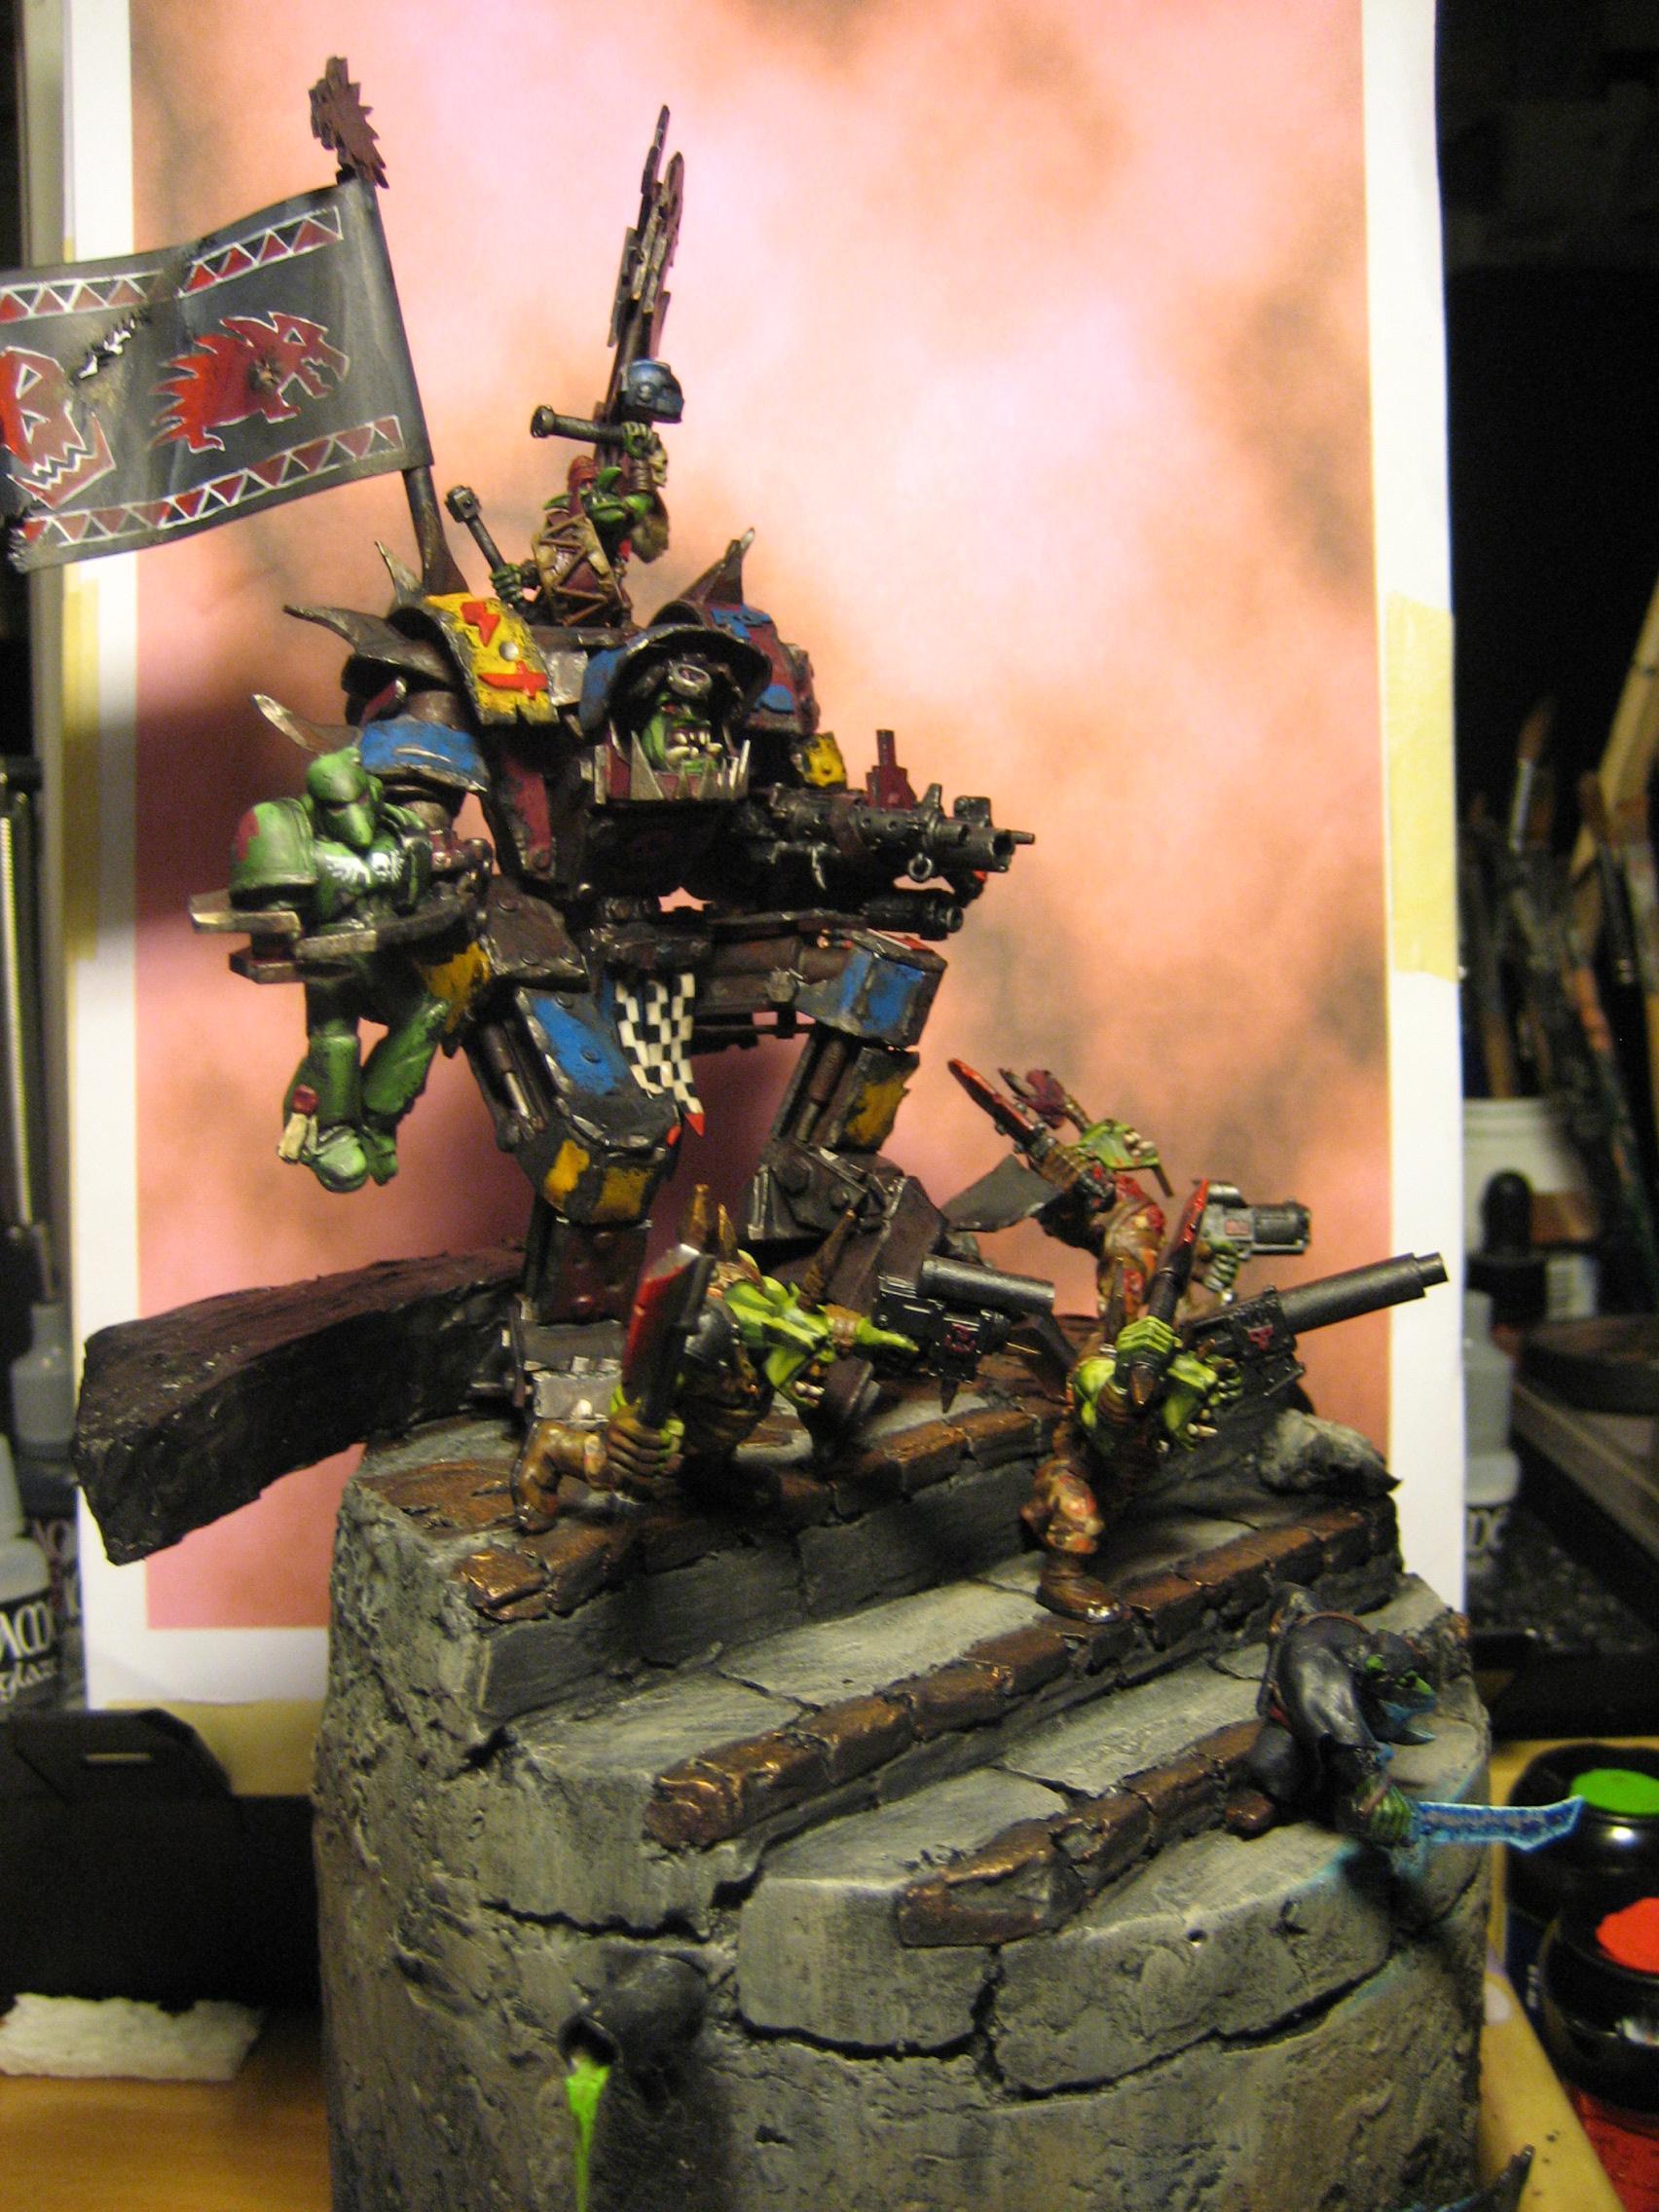 Diorama, Orks, Warboss, Warhammer 40,000